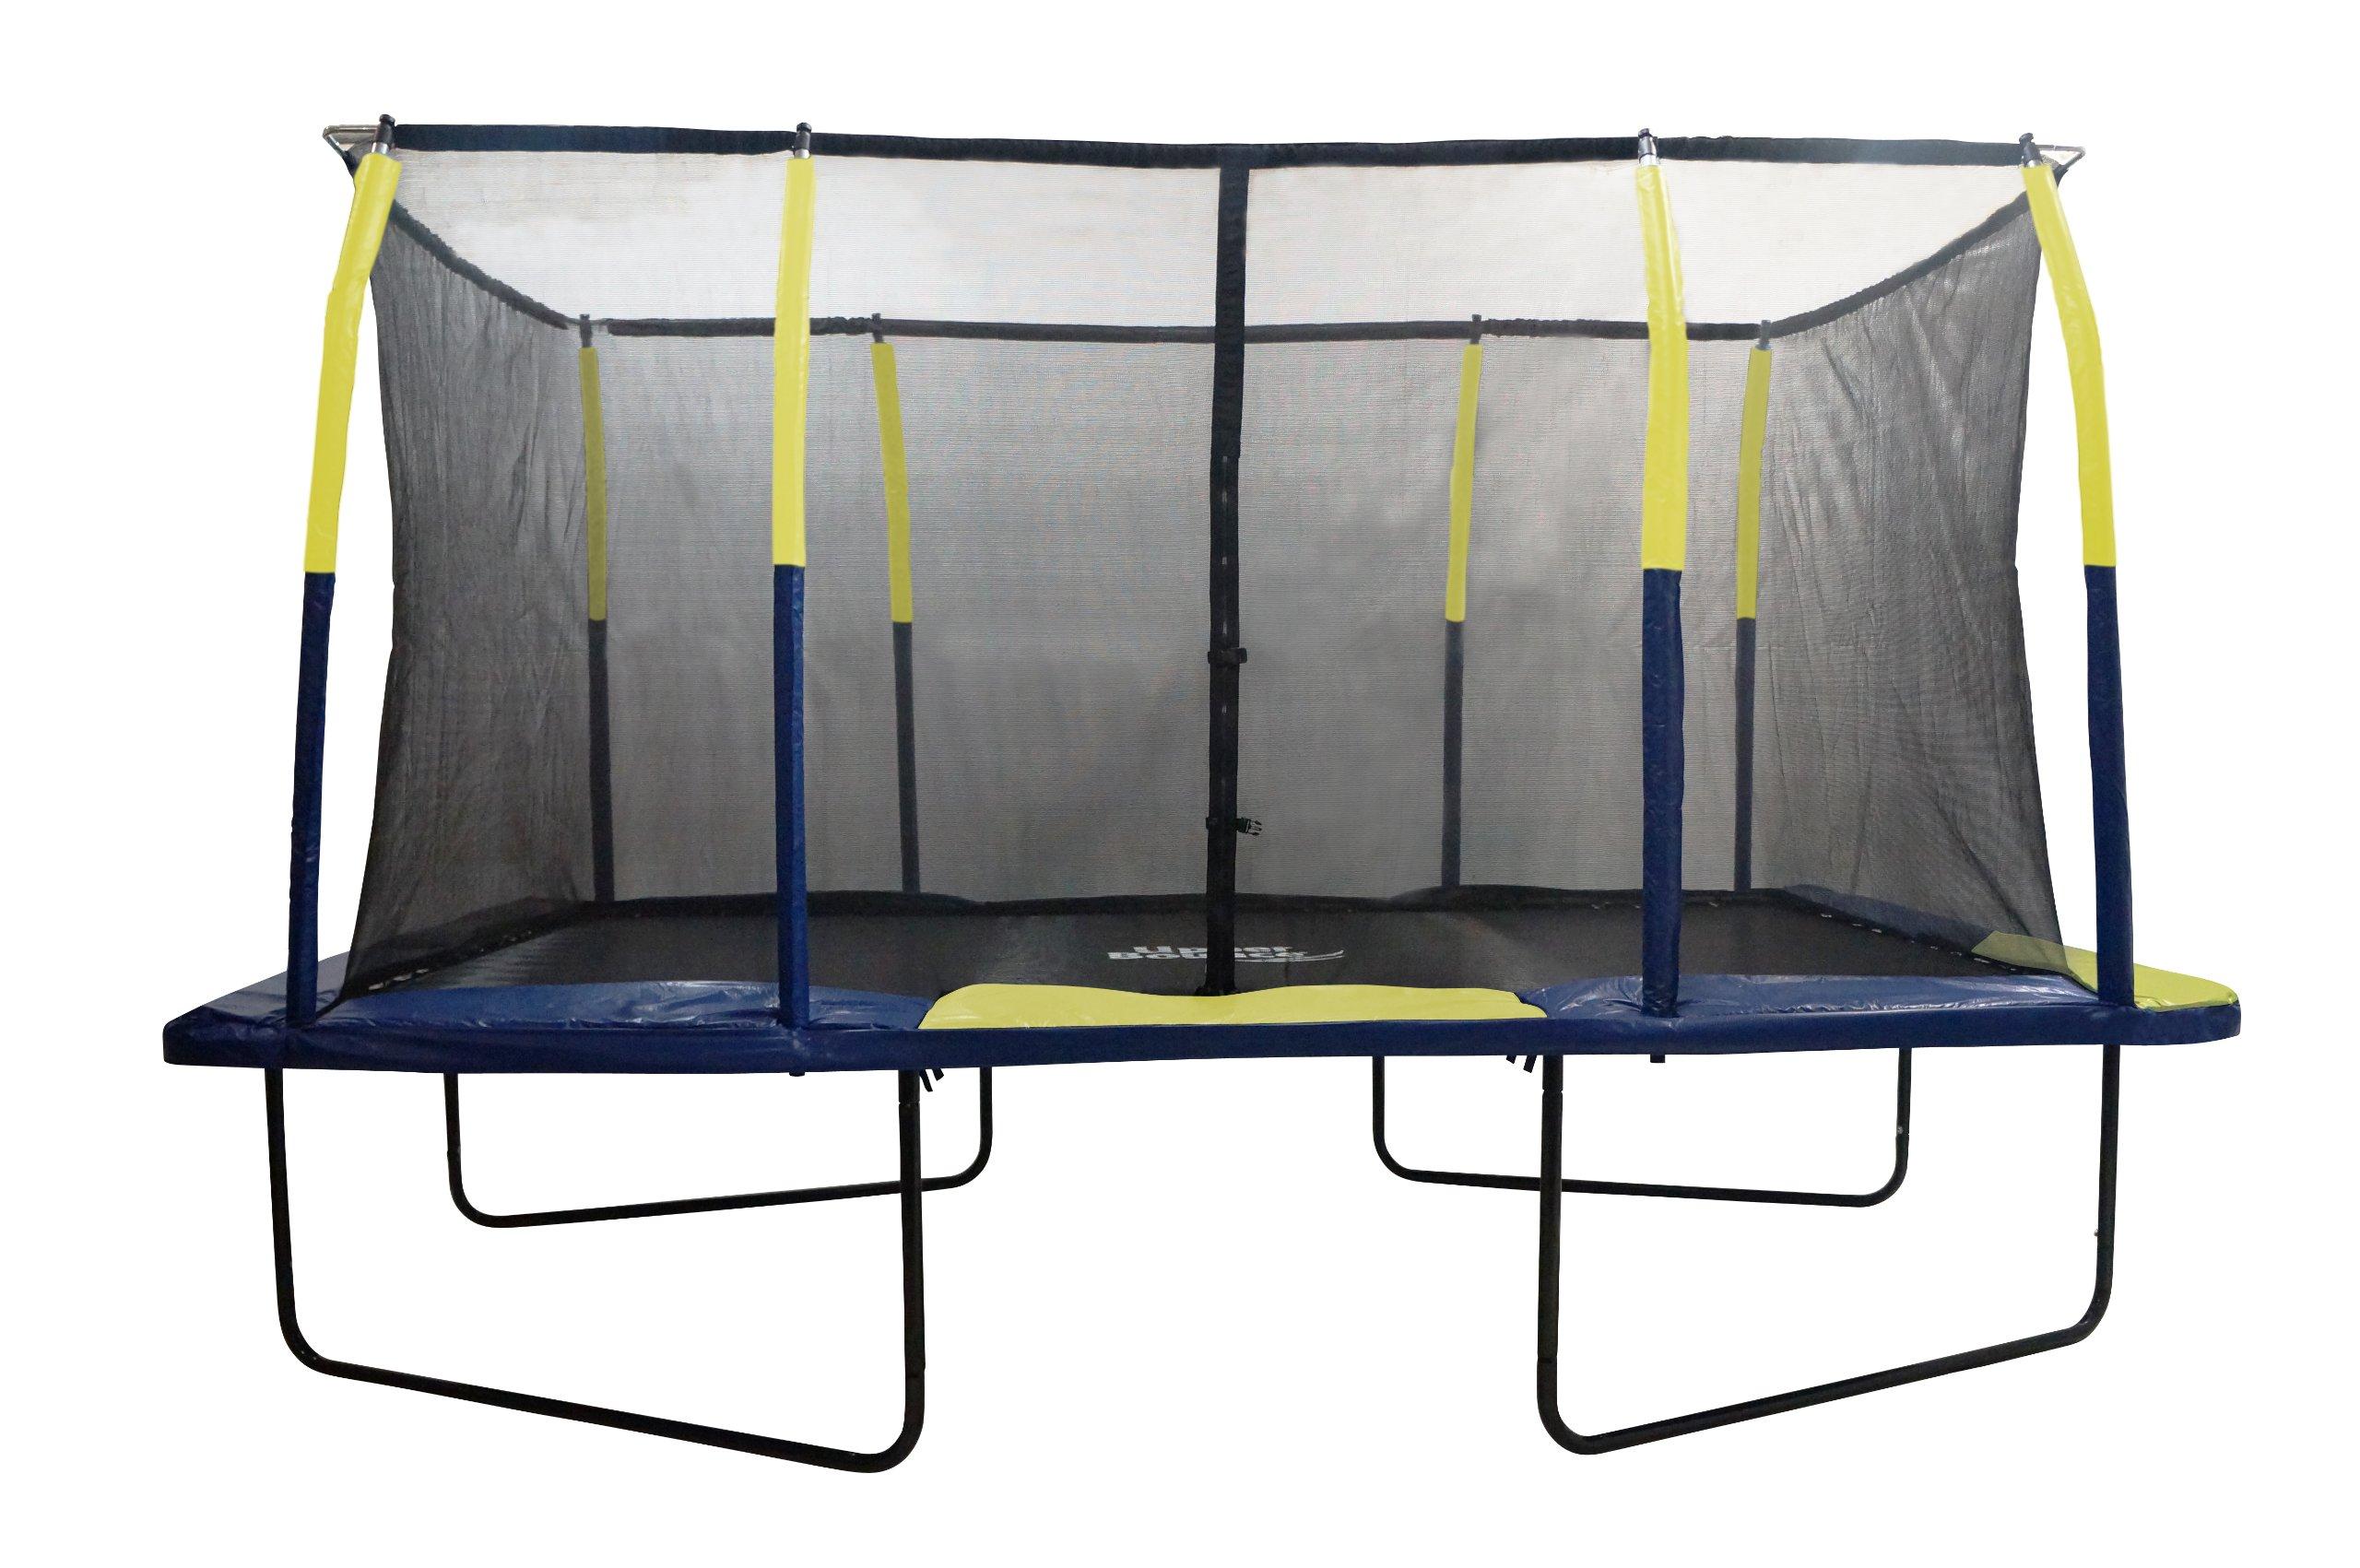 Upper Bounce Easy Assemble Spacious Rectangular Trampoline with Fiber Flex Enclosure Feature, 9 x 15-Feet